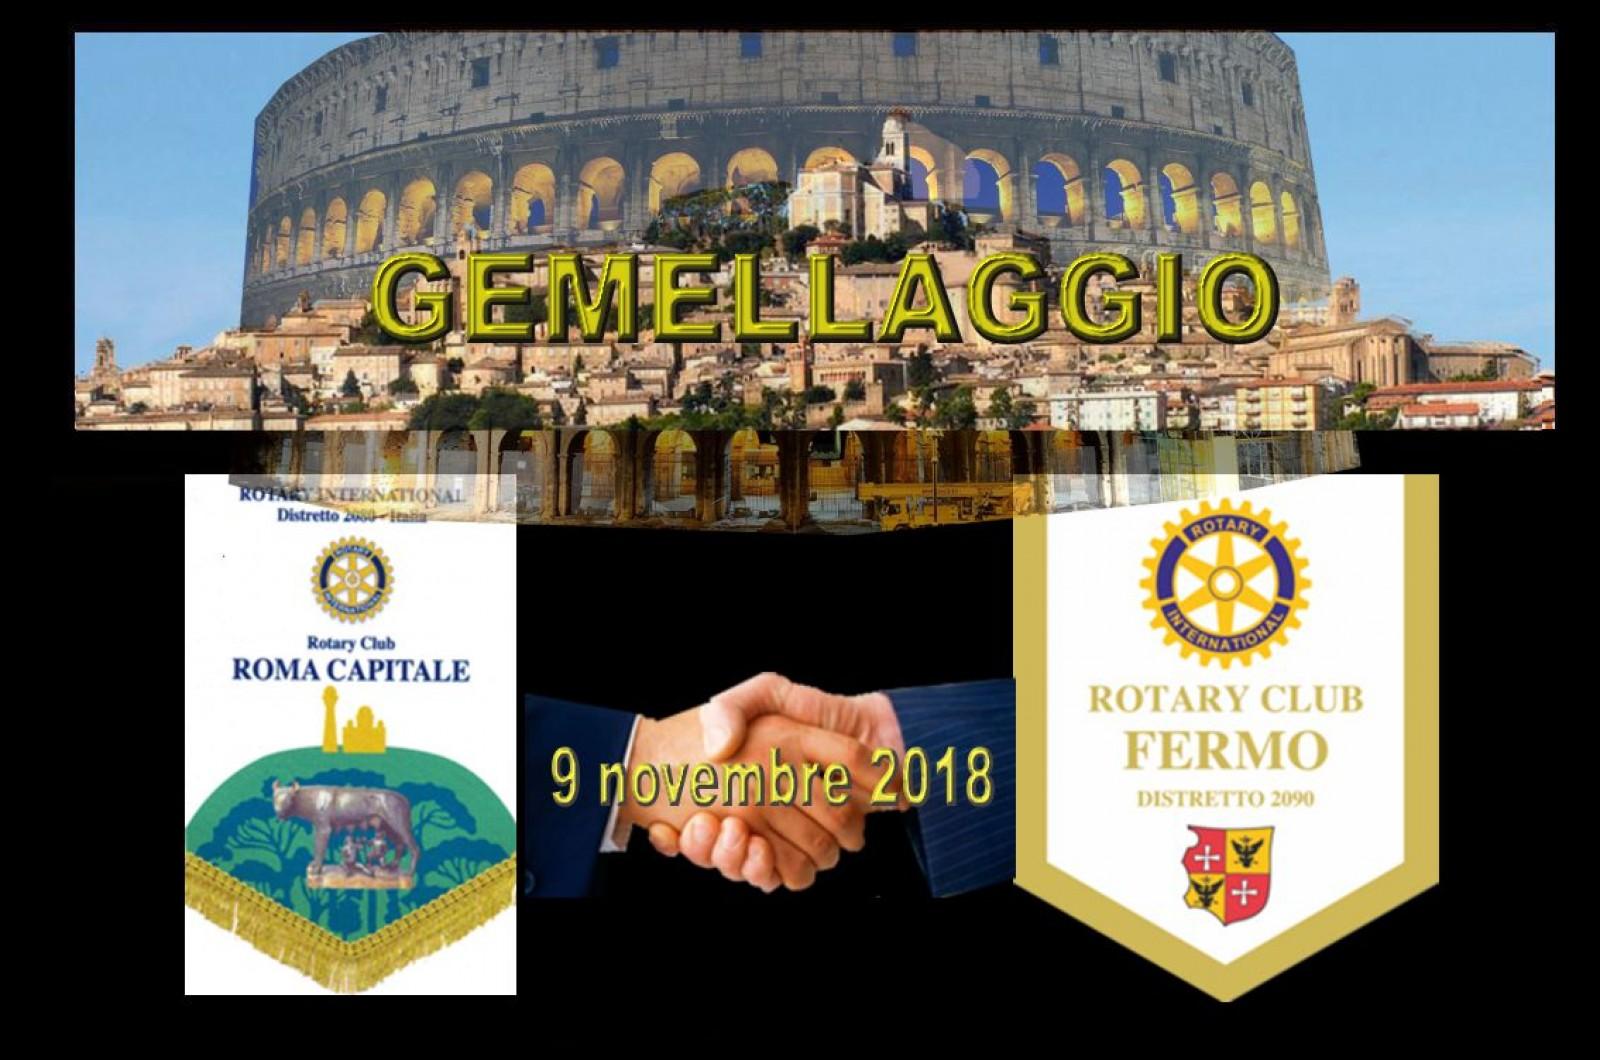 Gallery - Gemellaggio Rotary Club Roma Capitale e Rotary Club Fermo